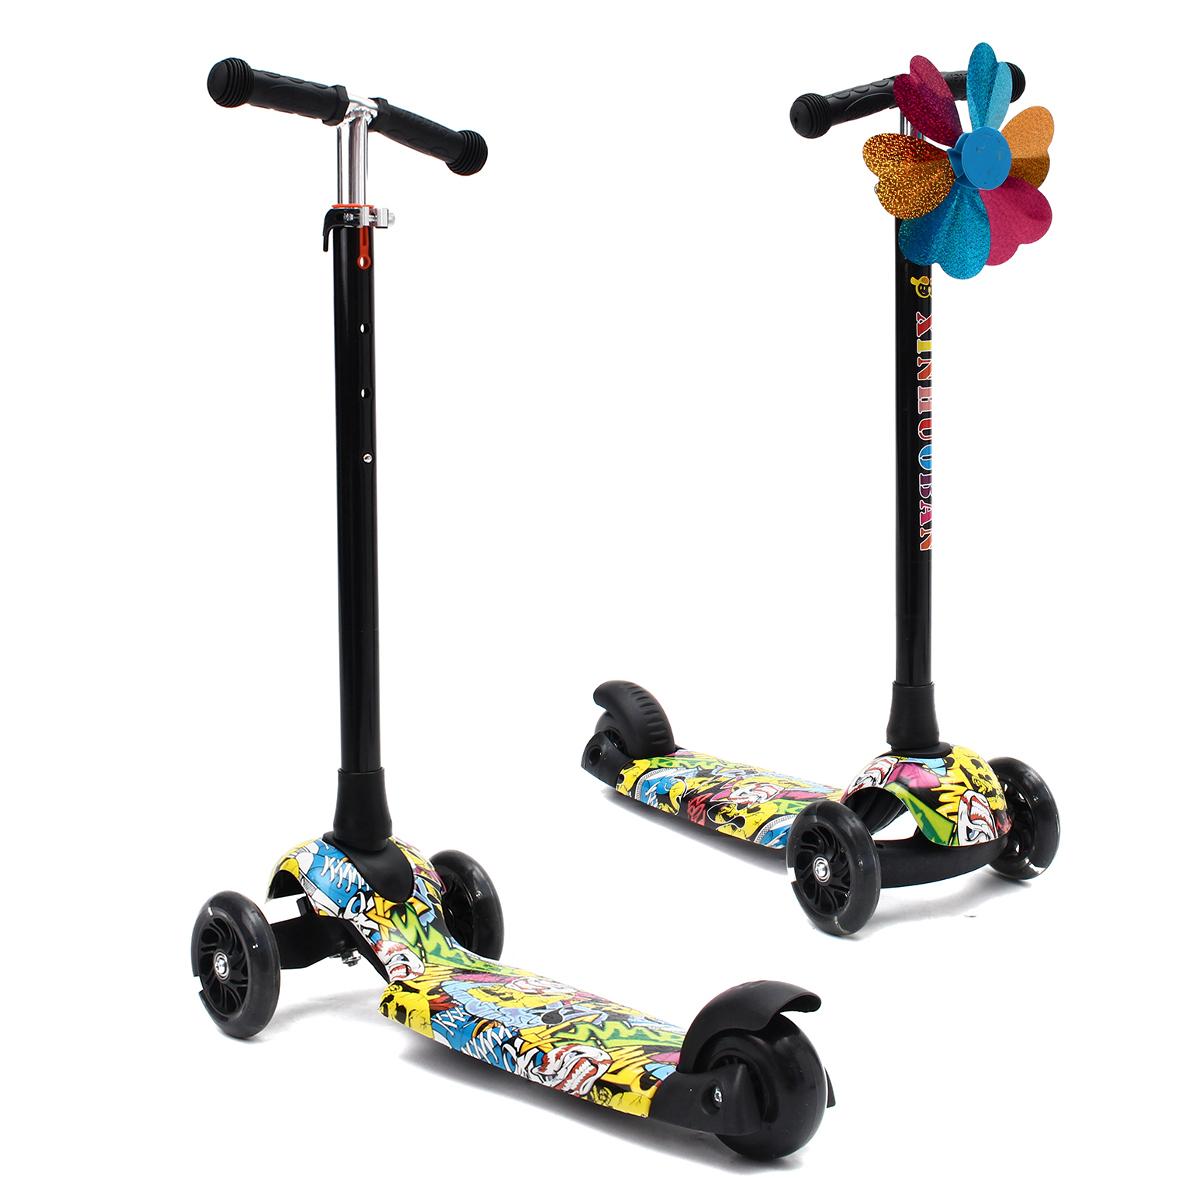 BIKIGHT Kids Folding Flashing 3 Wheels Tricycle Kick Push Children Scooter Kickb